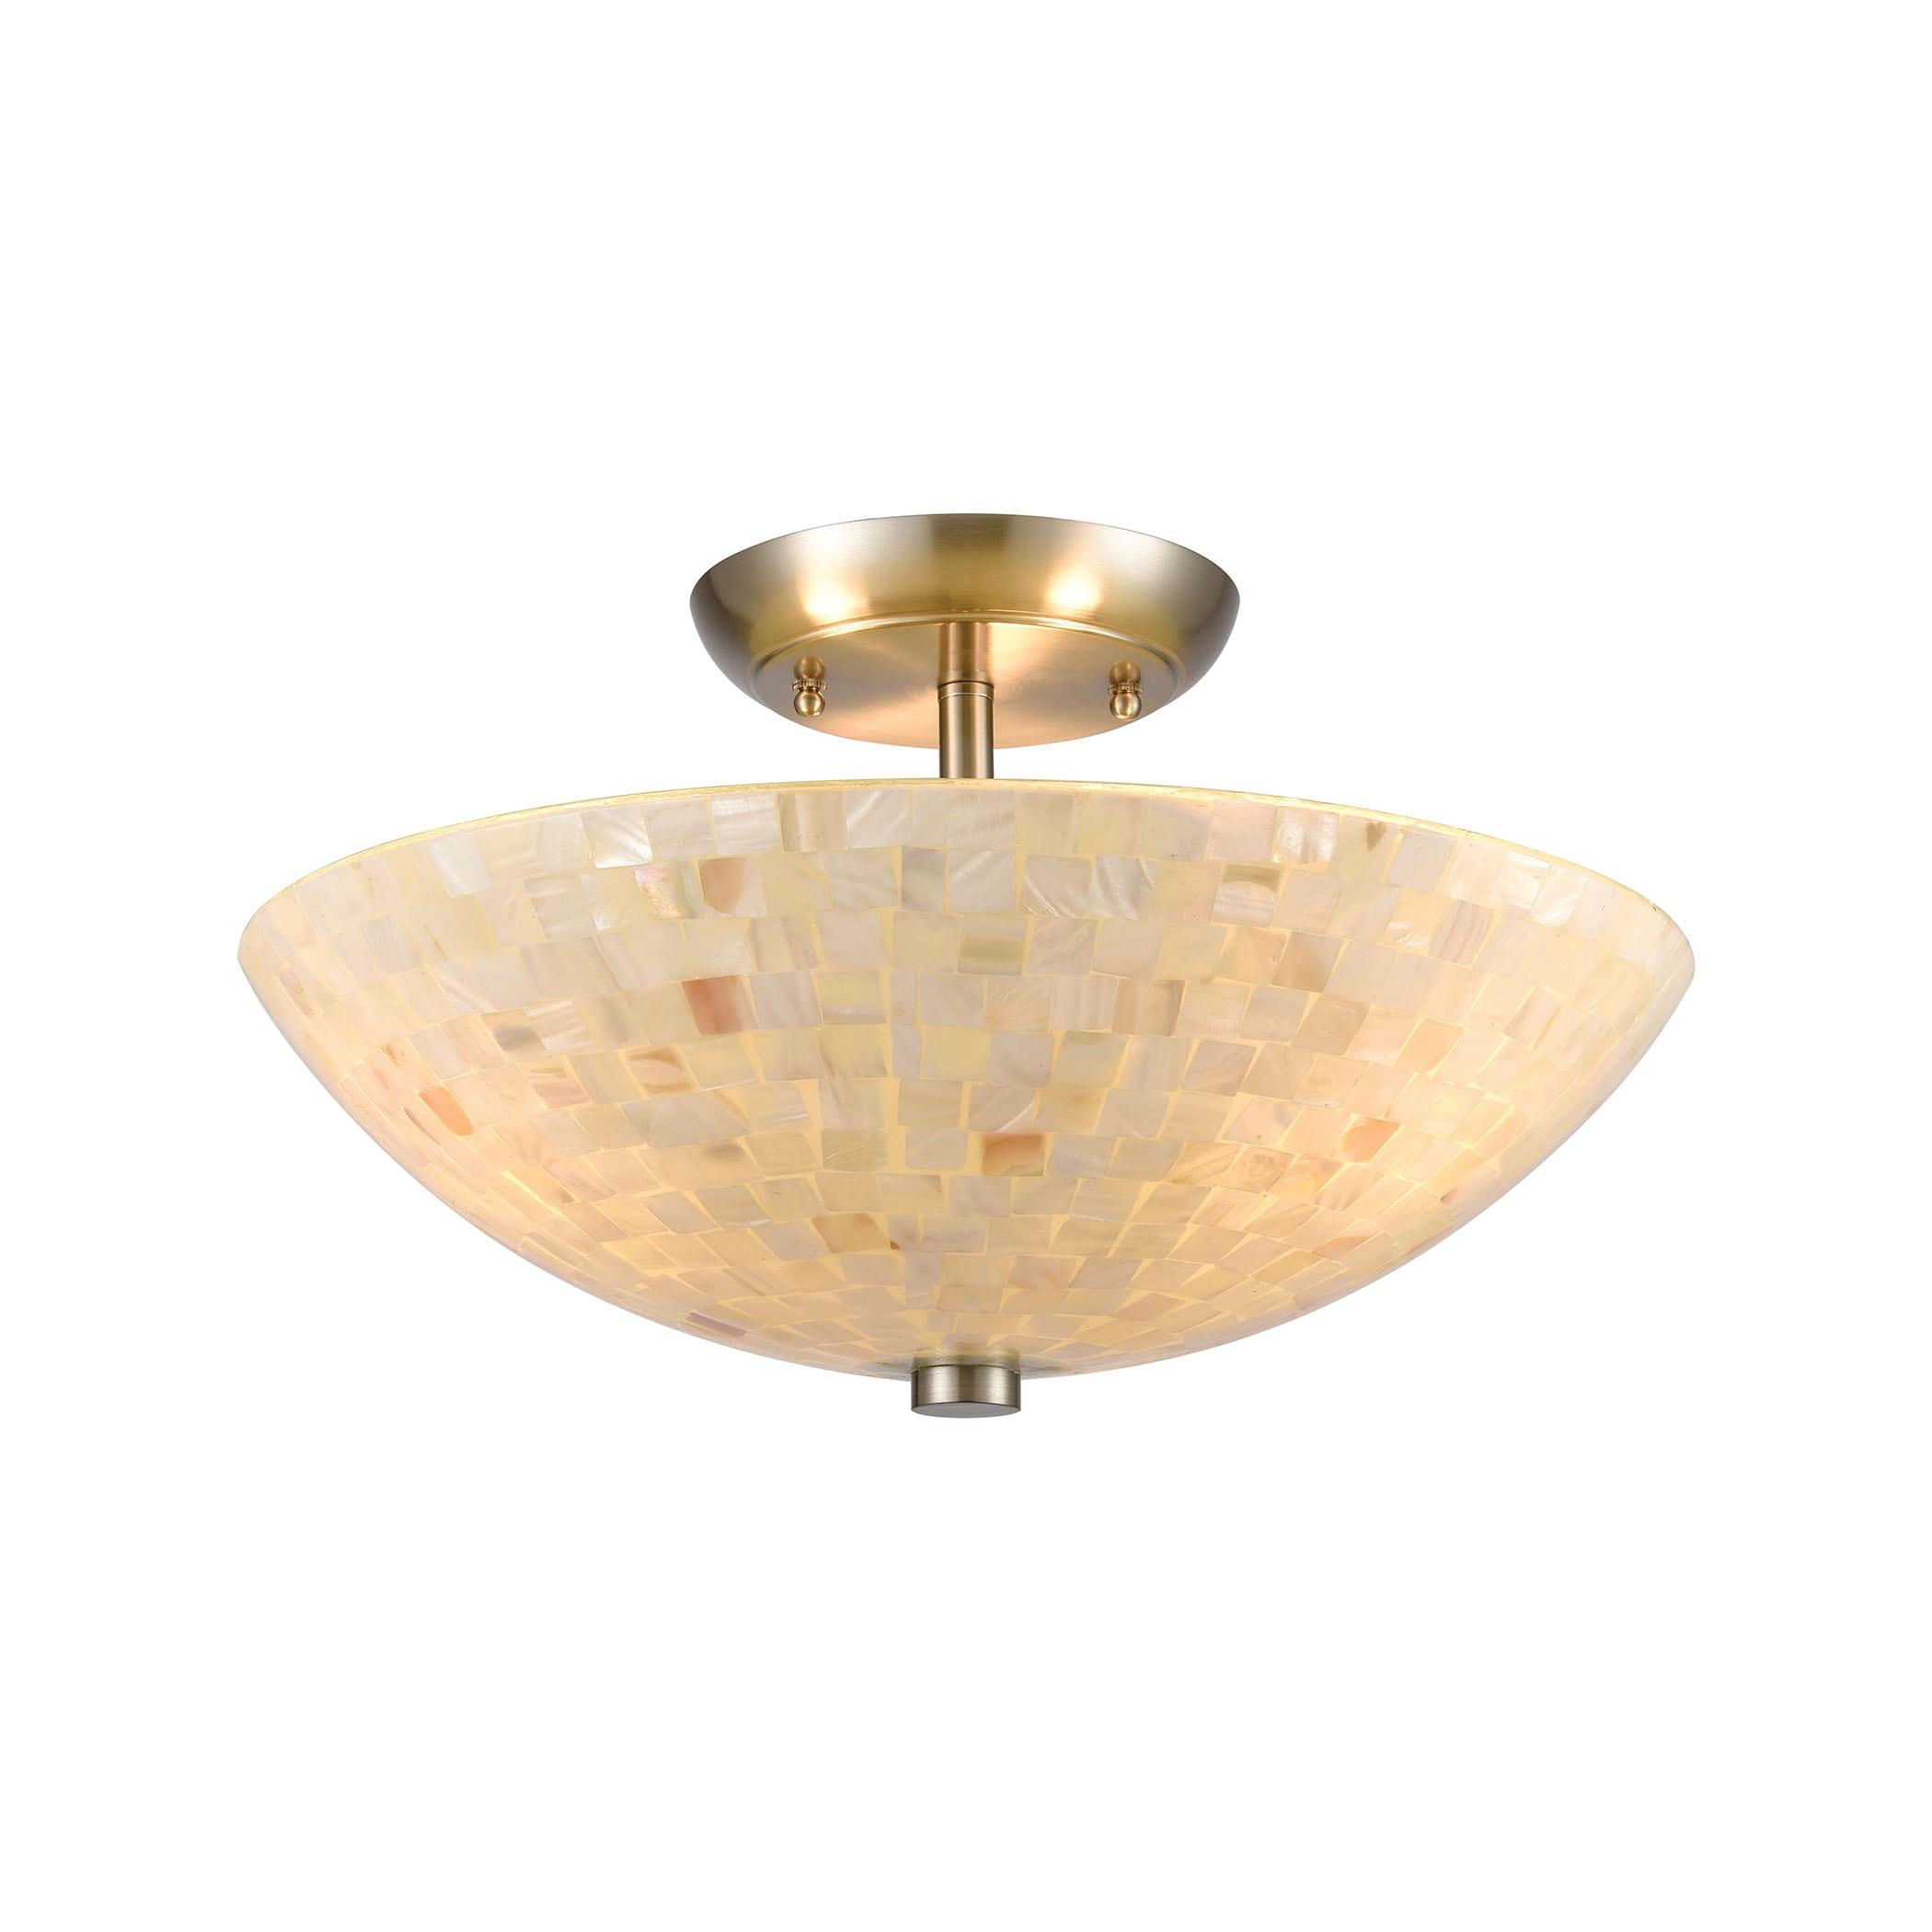 EL-10541/3_Capri 3-Light Semi Flush Mount in Satin Nickel with Glass/Capiz Shells